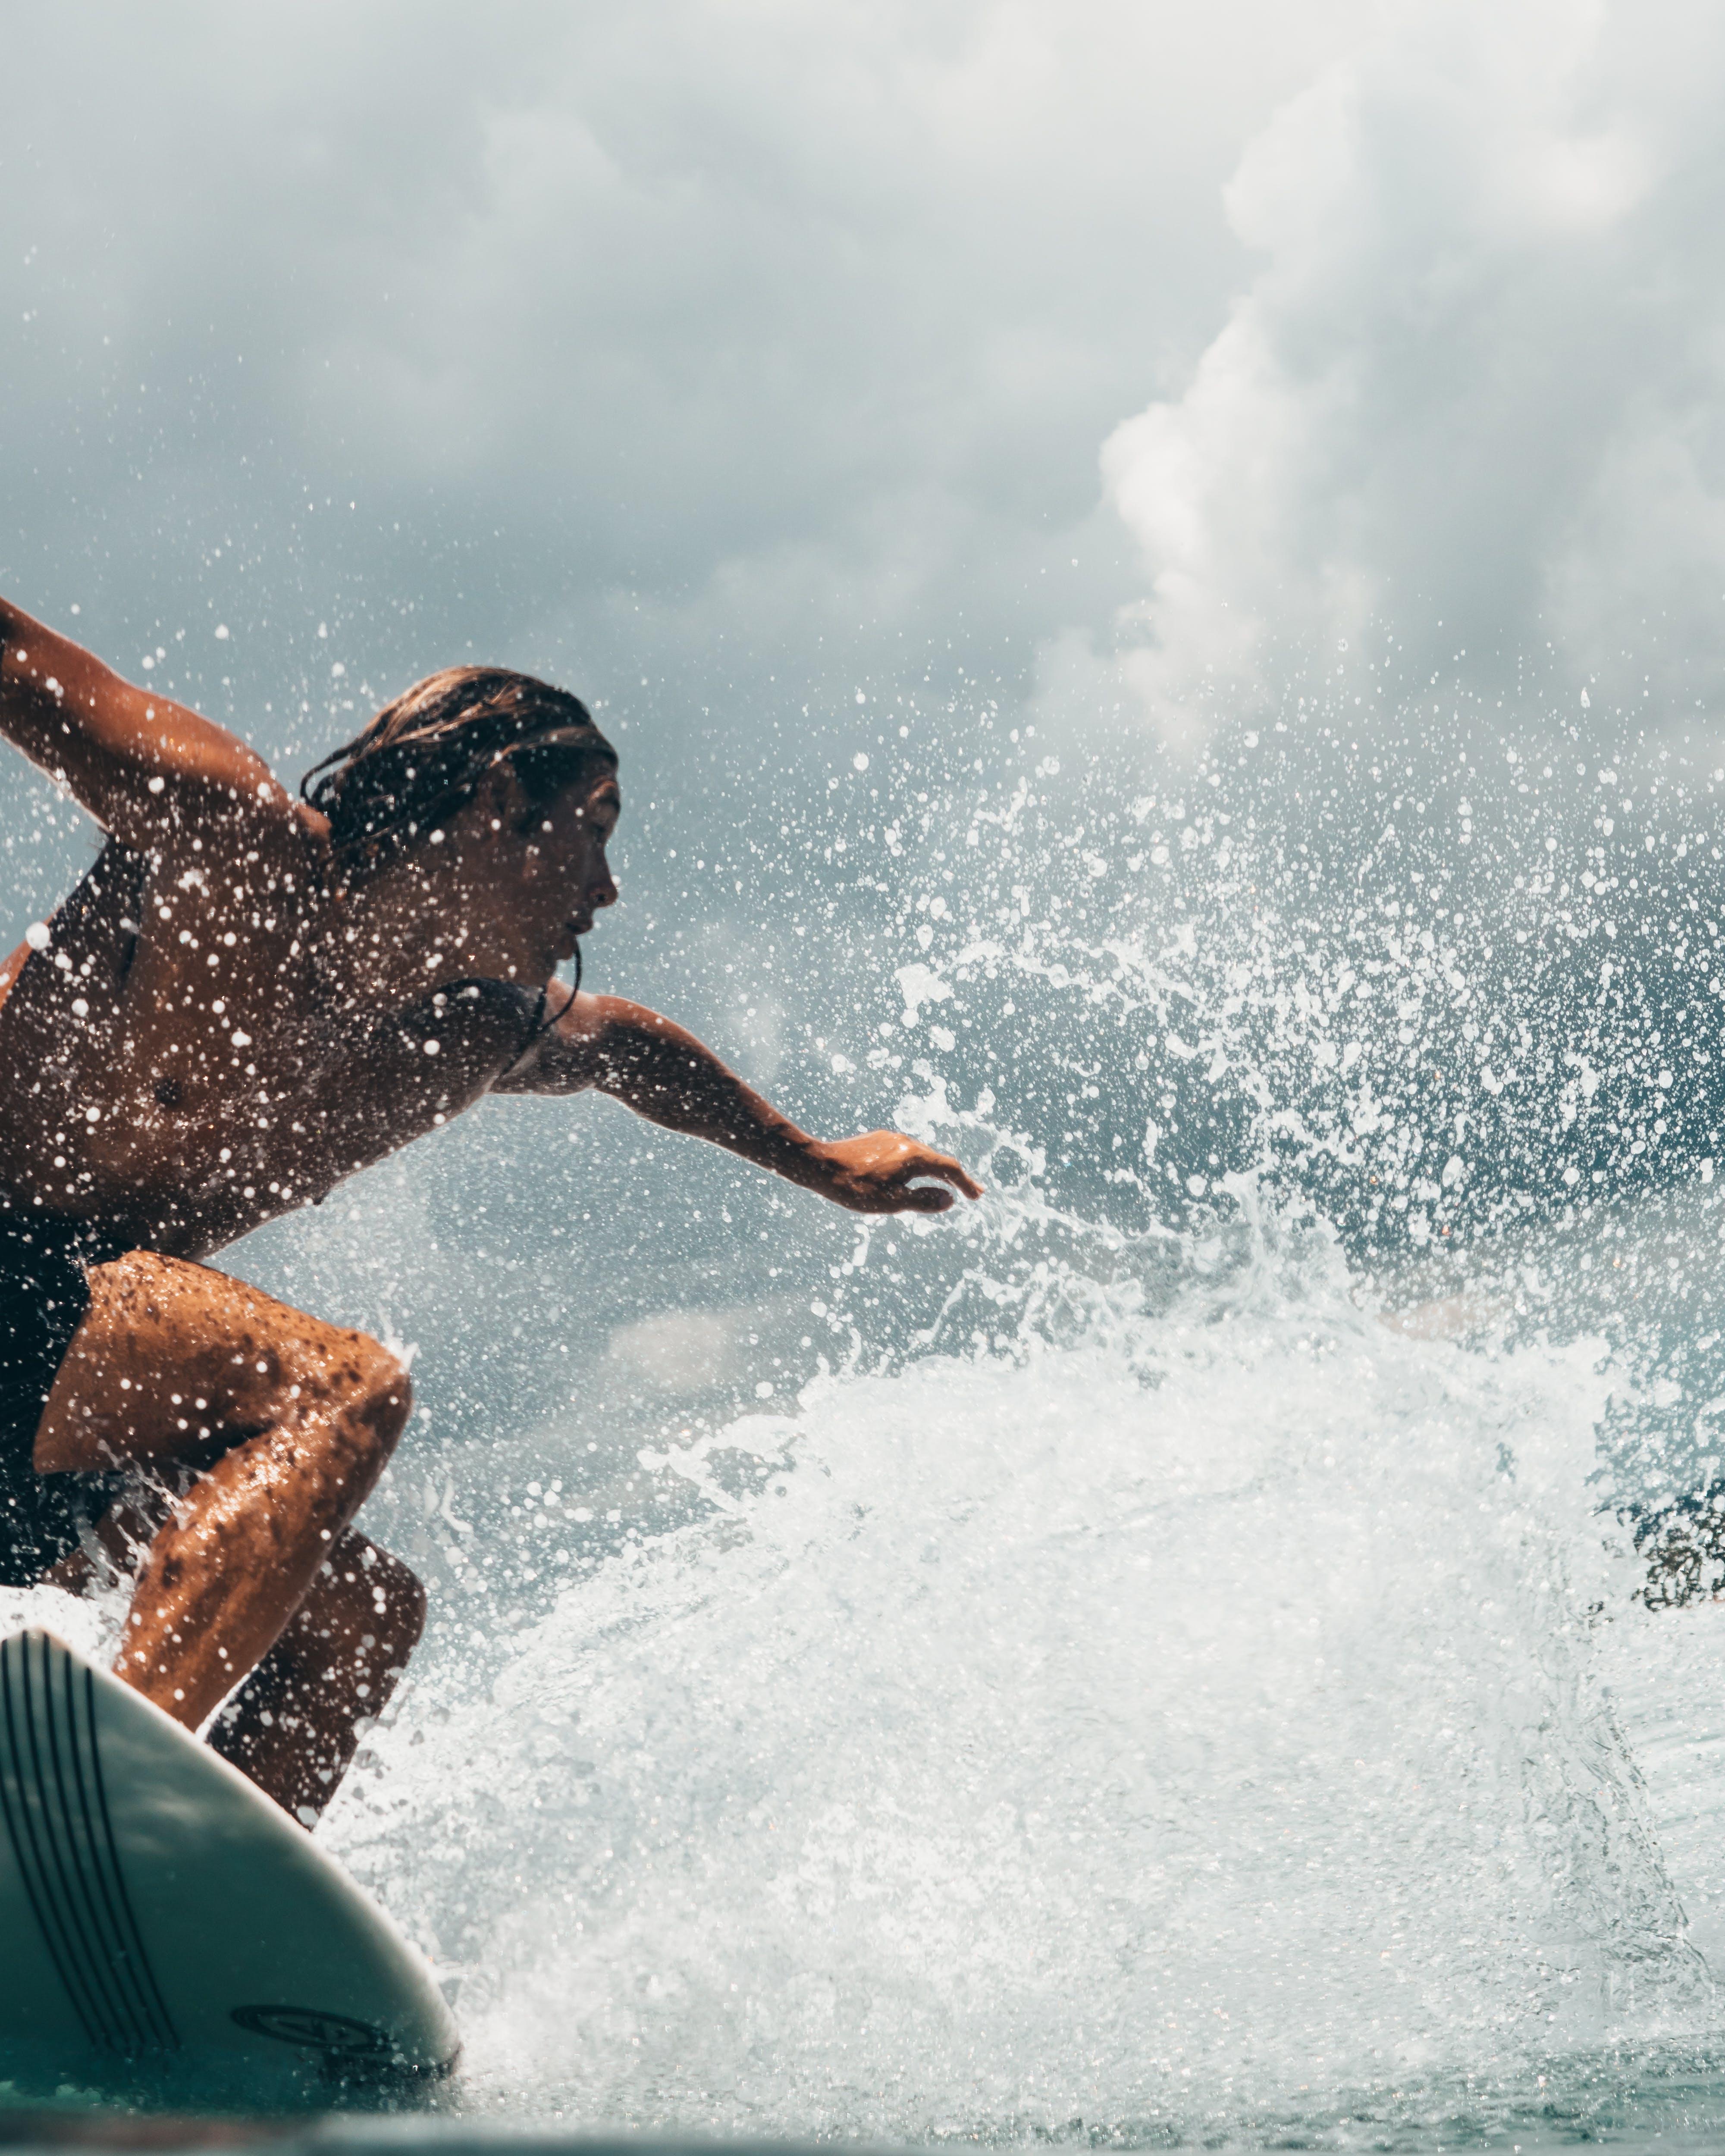 Man Riding White Surfboard